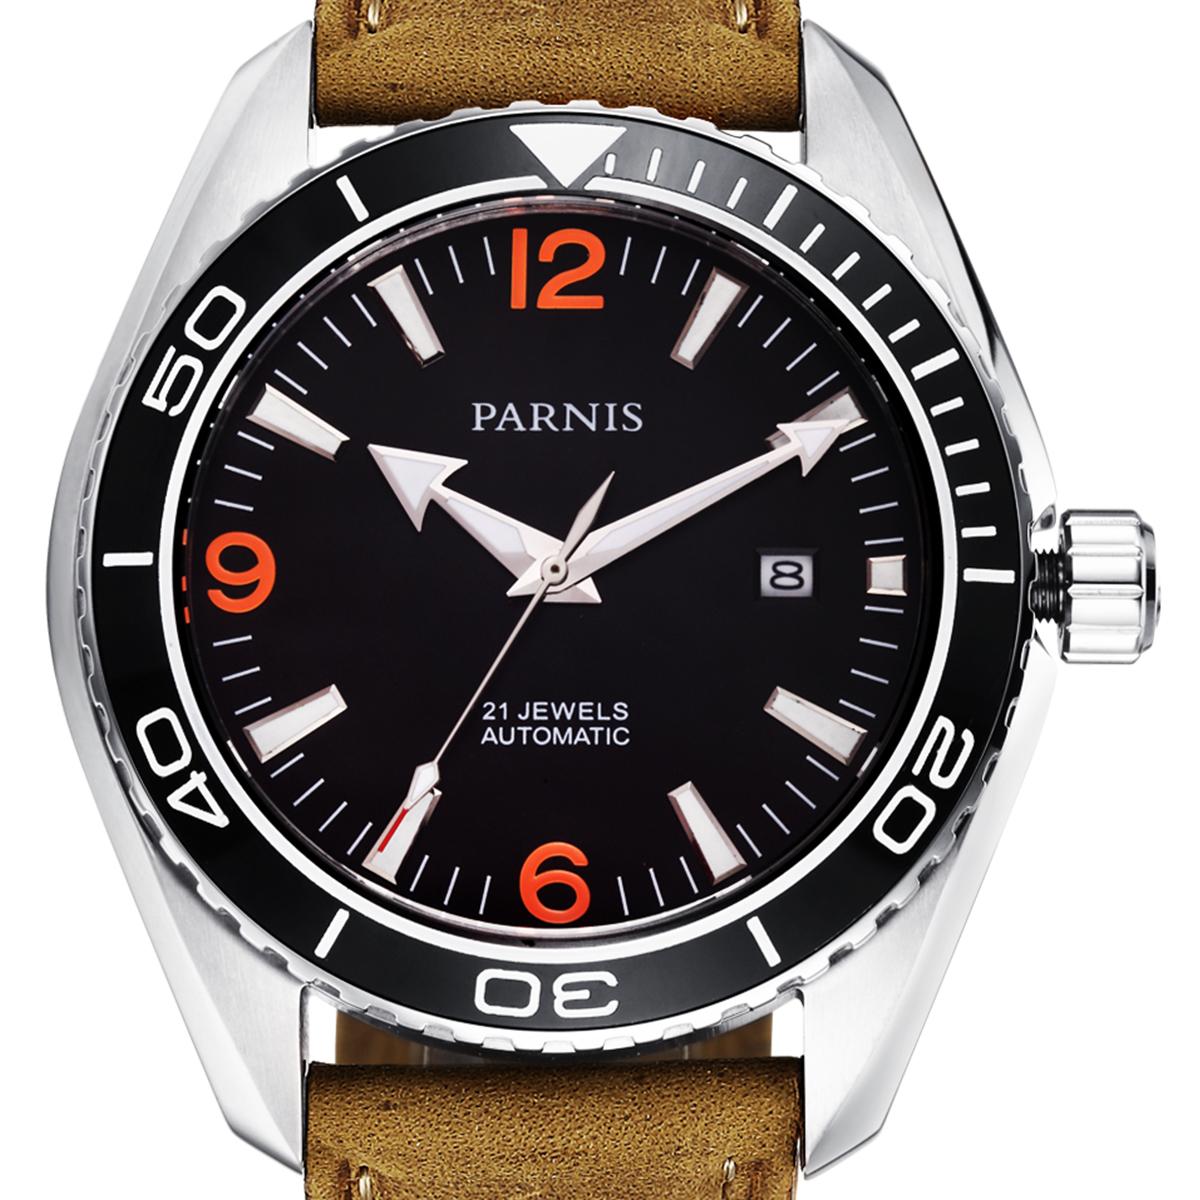 【NEW】PARNIS パーニス 自動巻き 腕時計 [PA6032-S3AL-SVBR] 並行輸入品 純正ケース メーカー保証12ヶ月